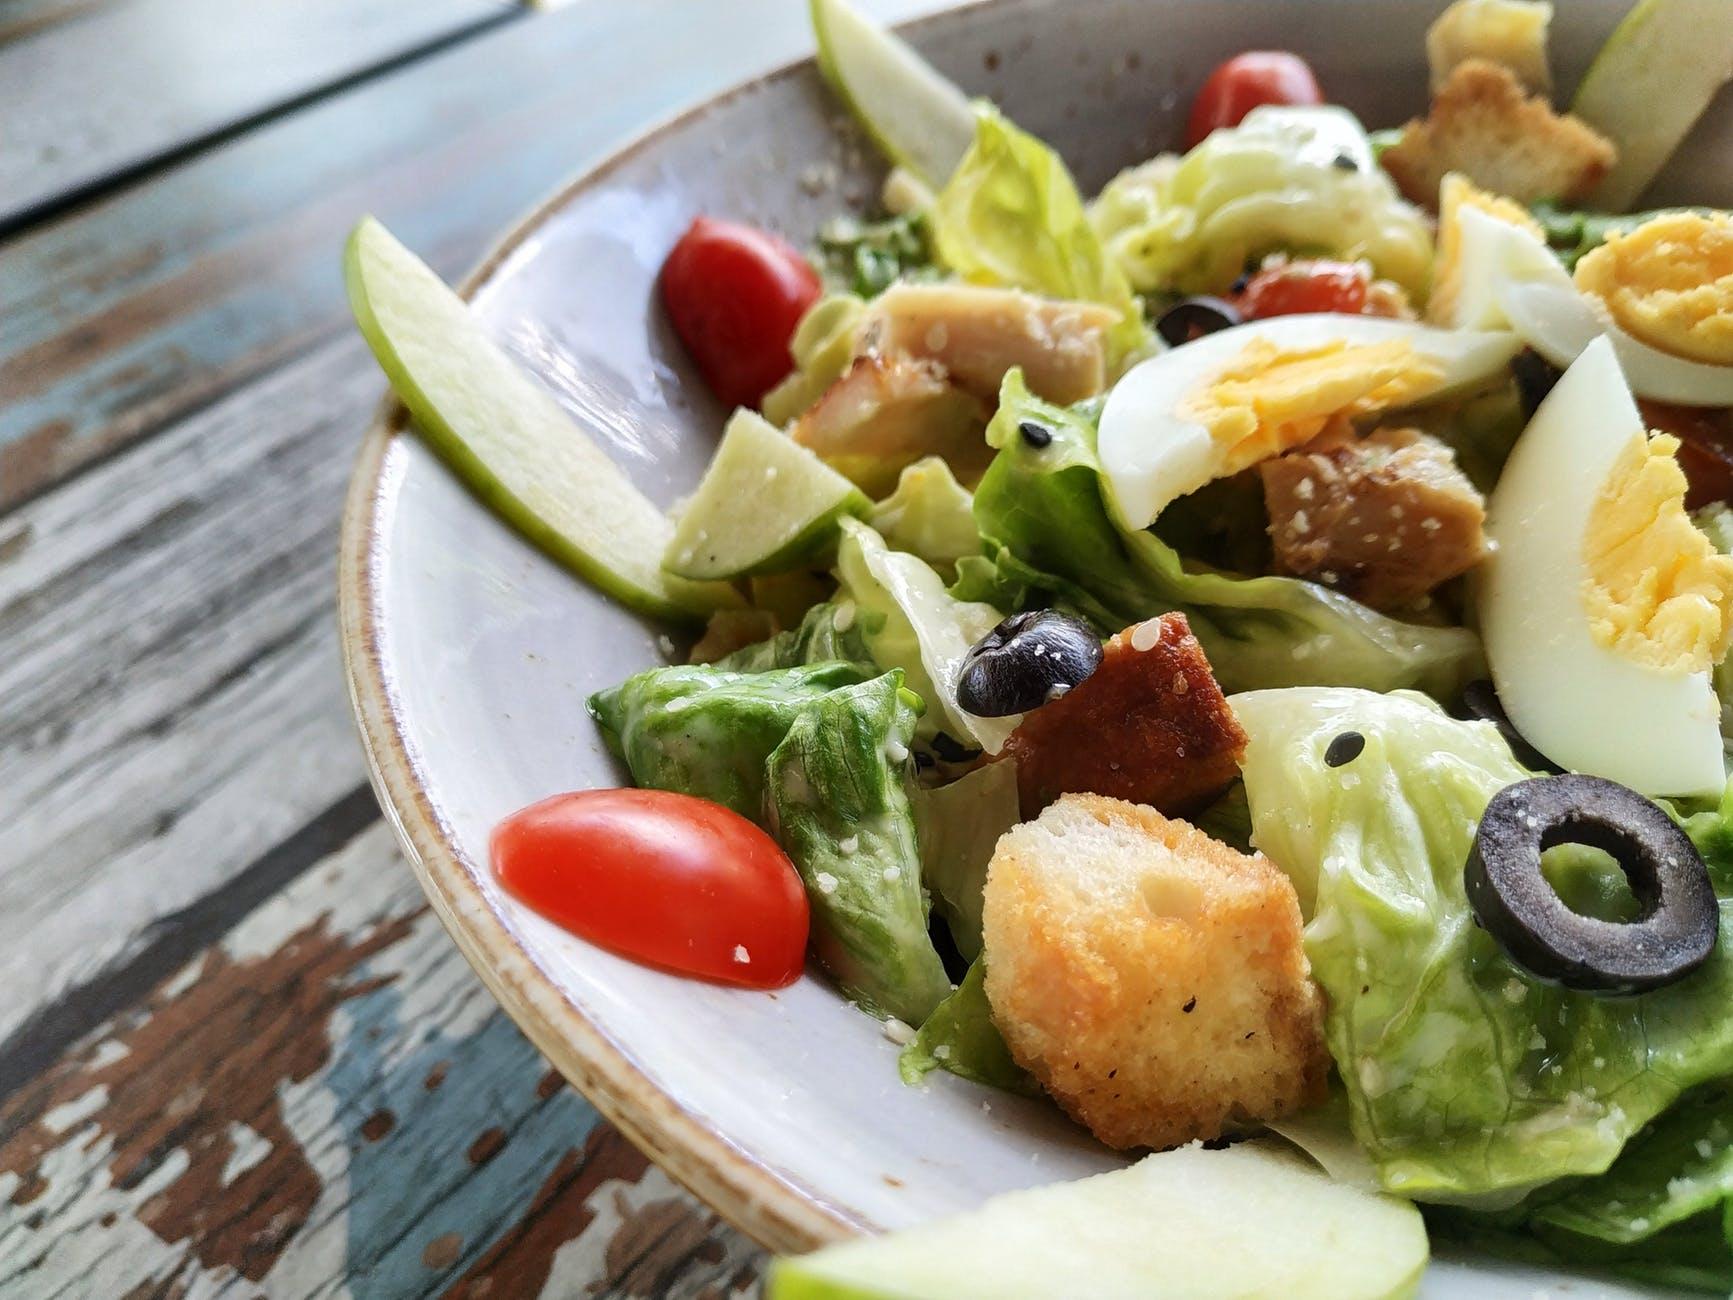 salad ức gà giảm cân6